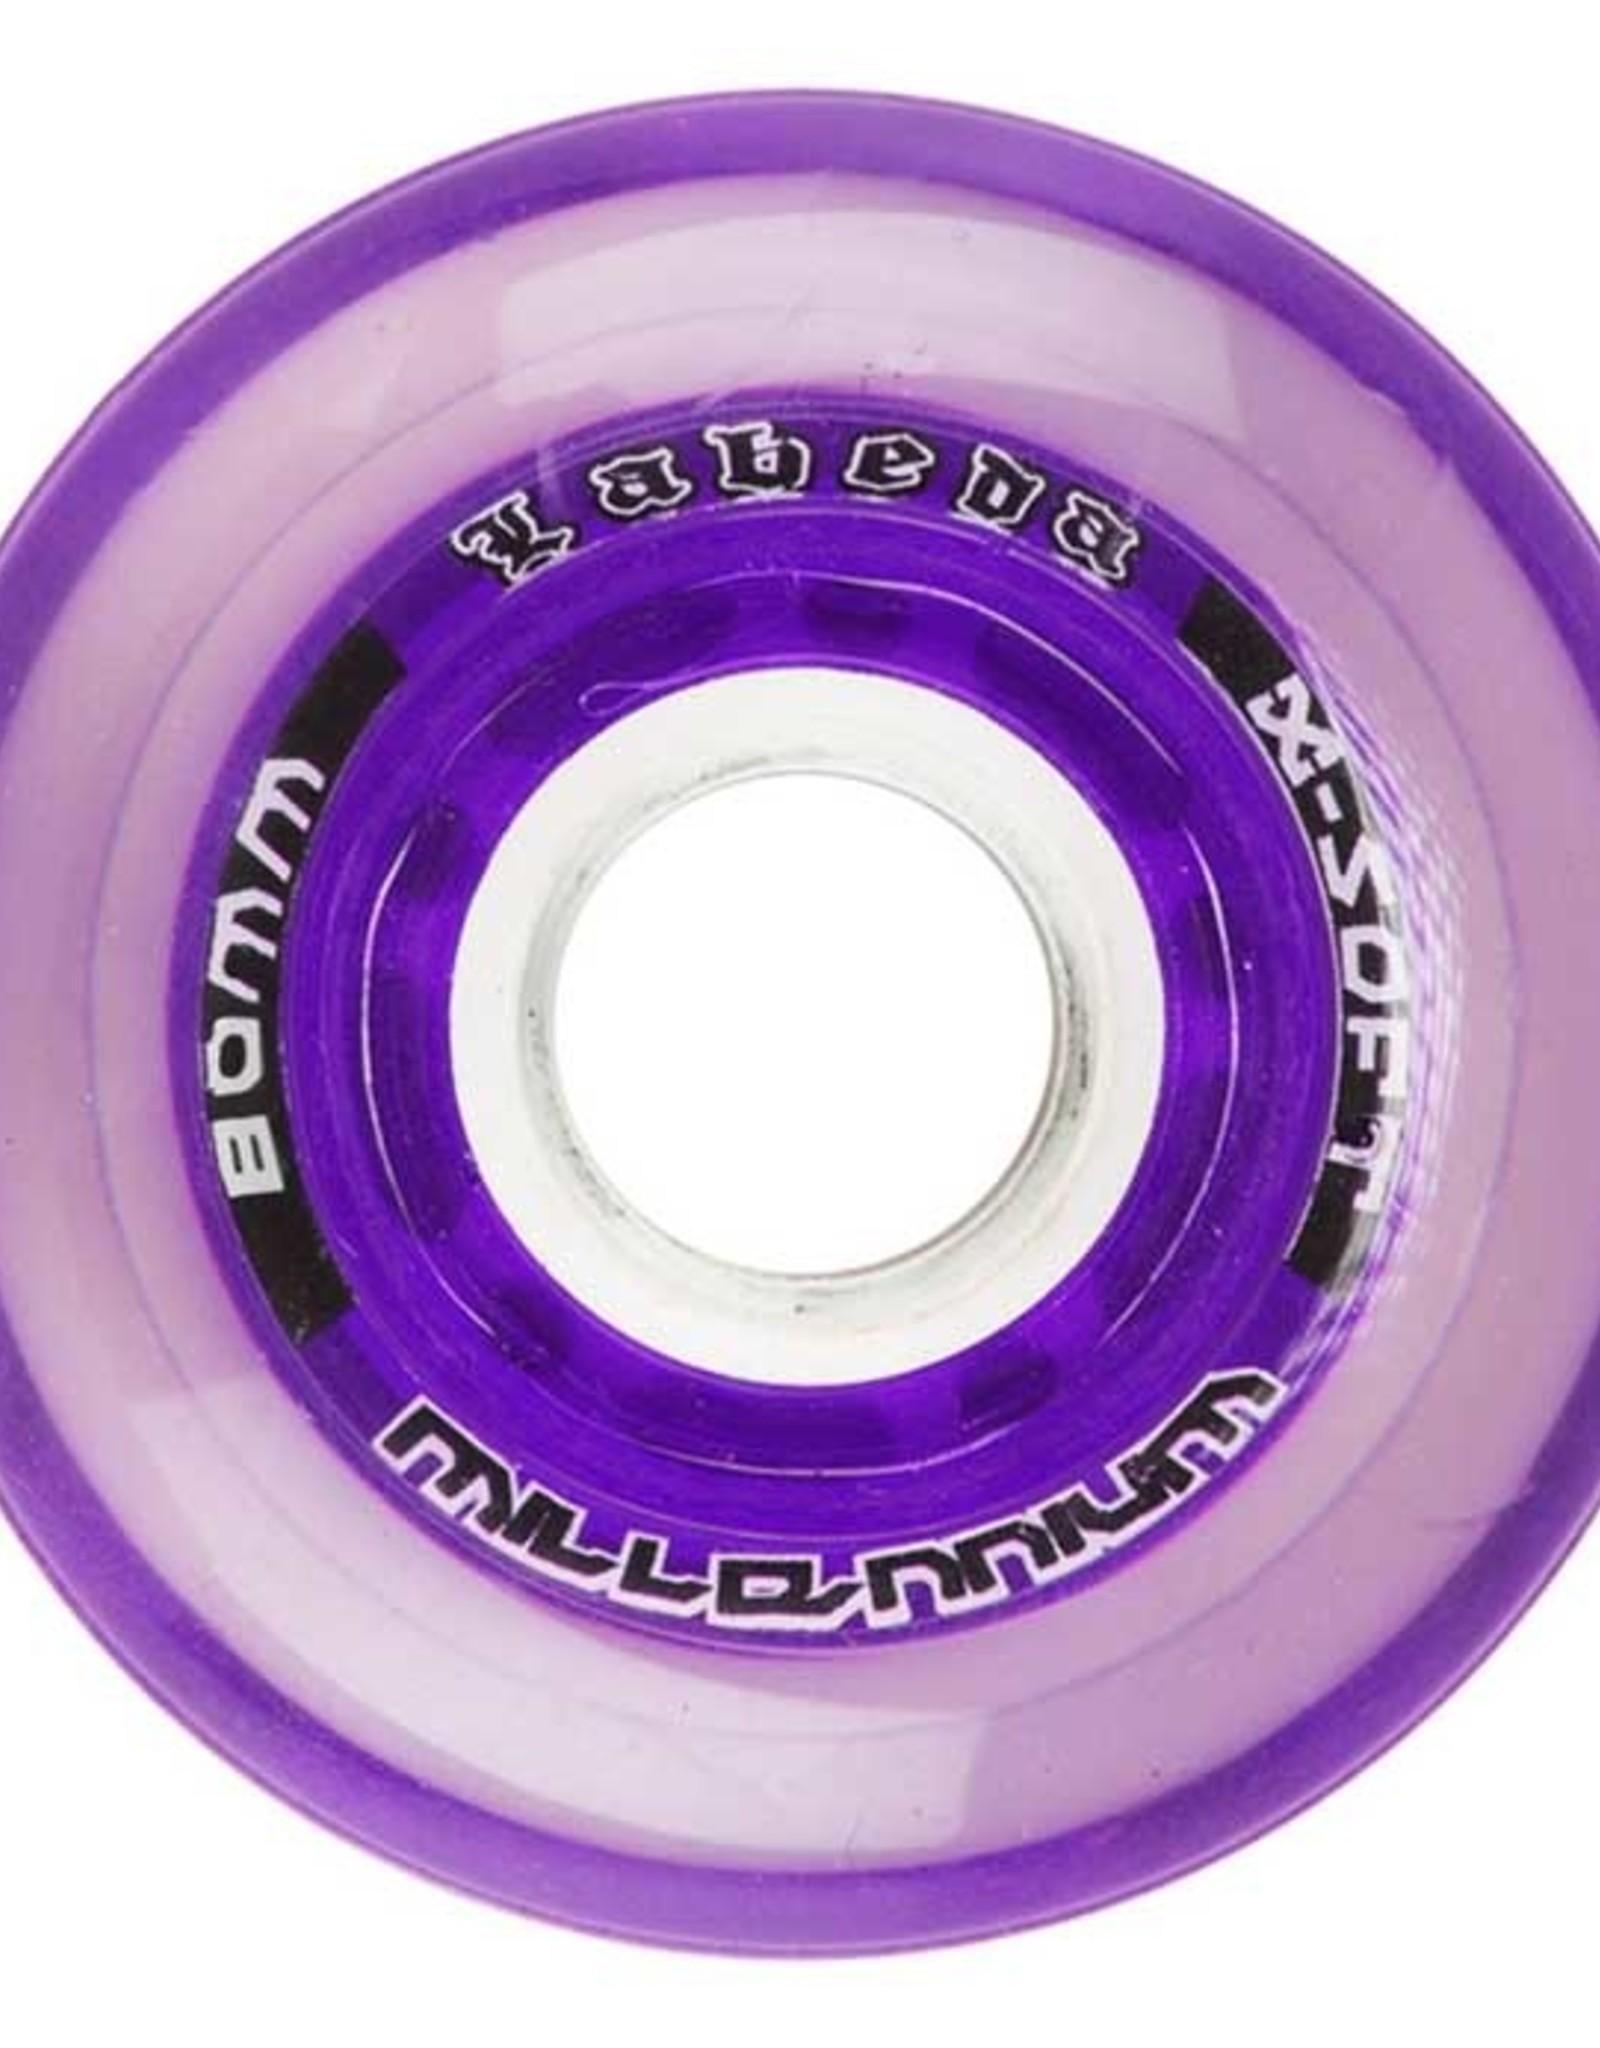 Labeda Labeda Millennium Wheel